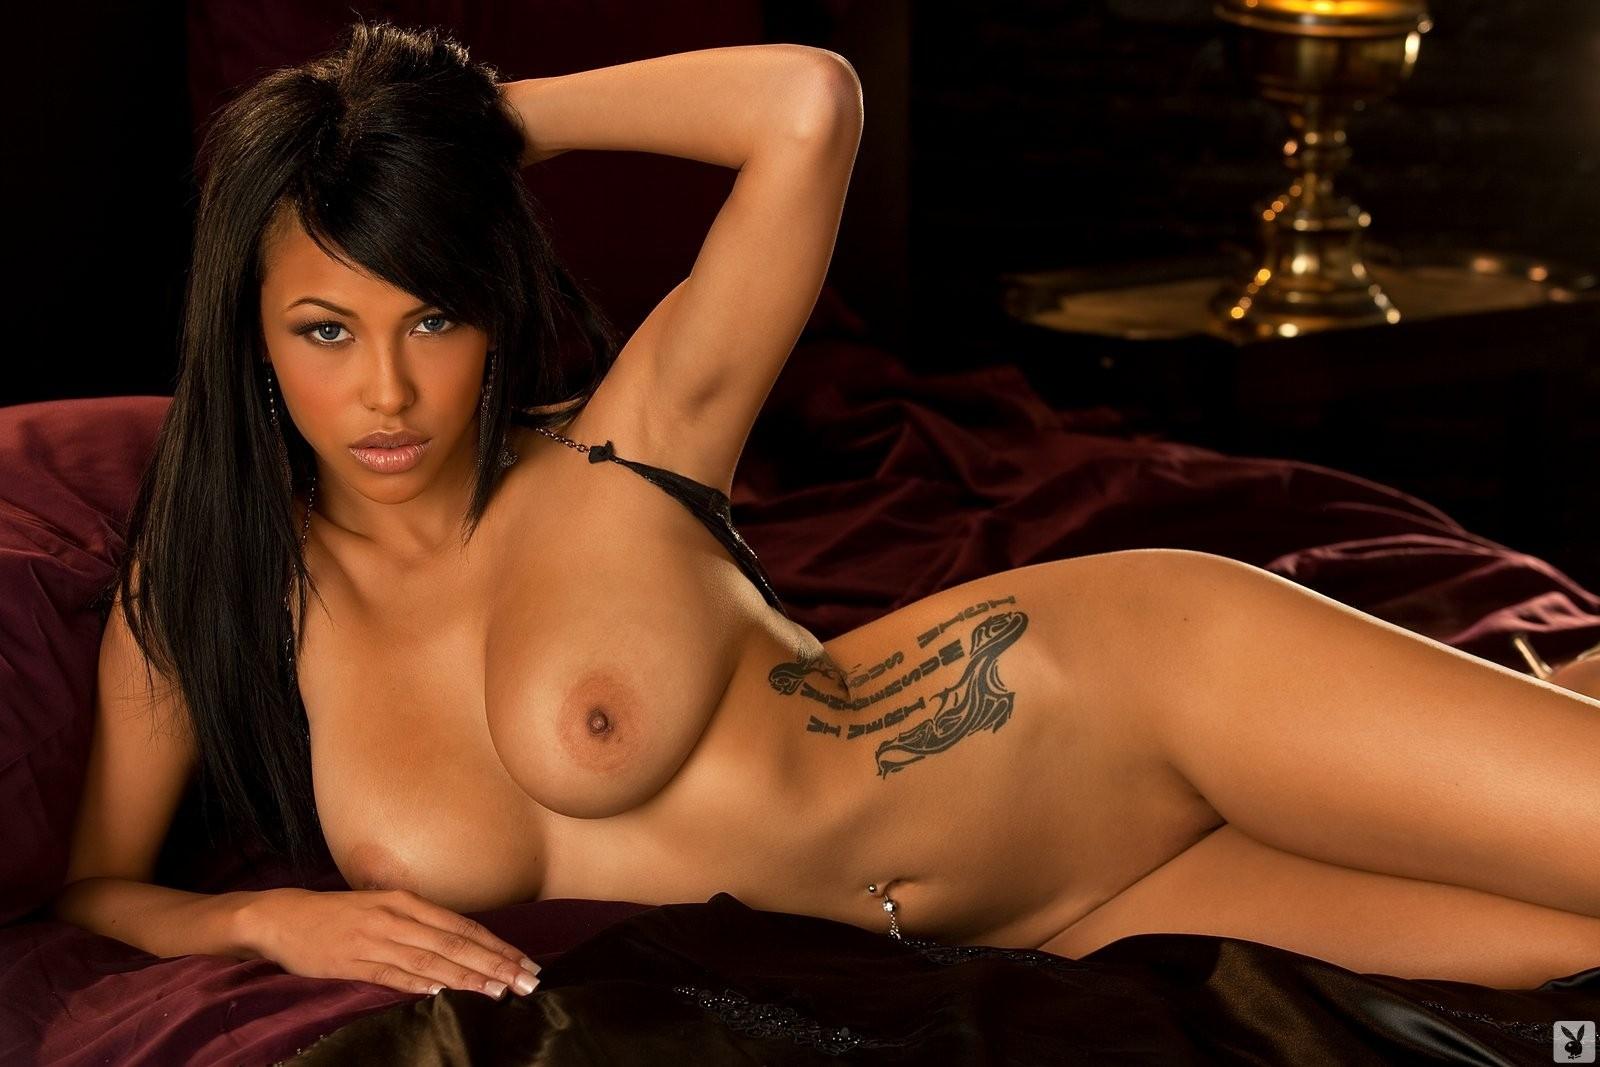 kylie Playboy johnson nude playmate